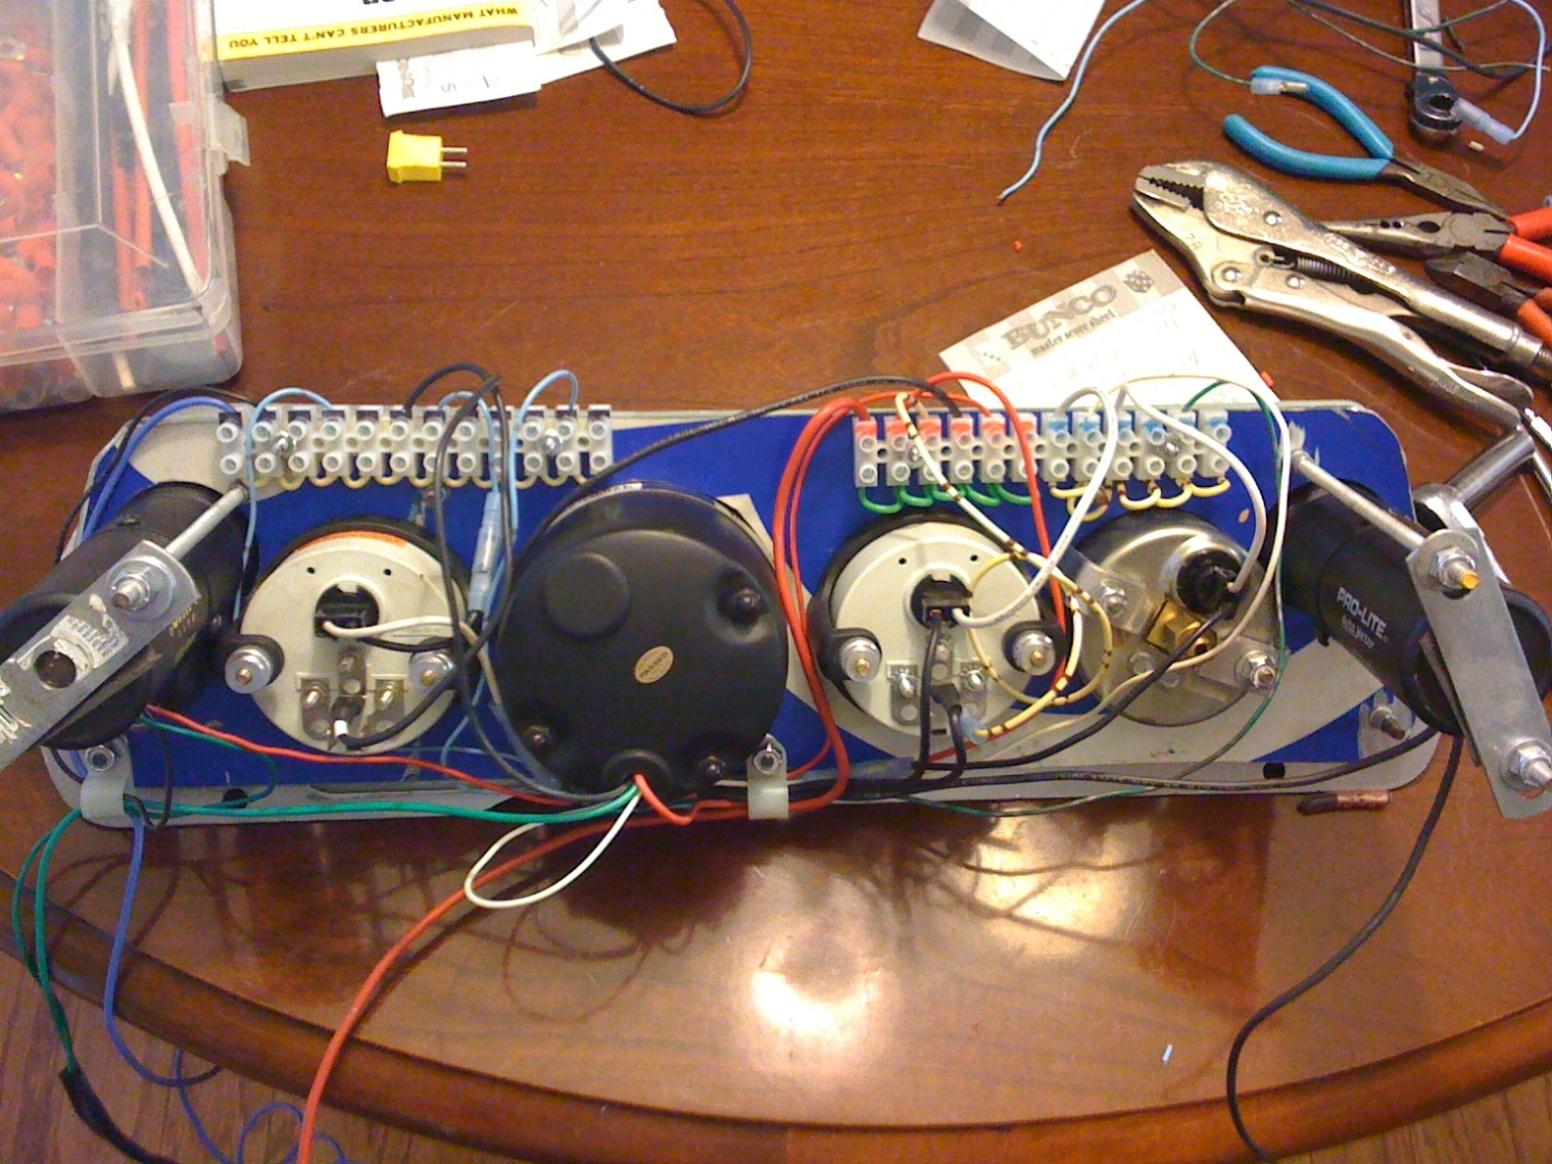 Race Car Wiring Unlawfls Engine Tech Moparts Forums Painless Switch Panel 5757407 Gaugepanel3